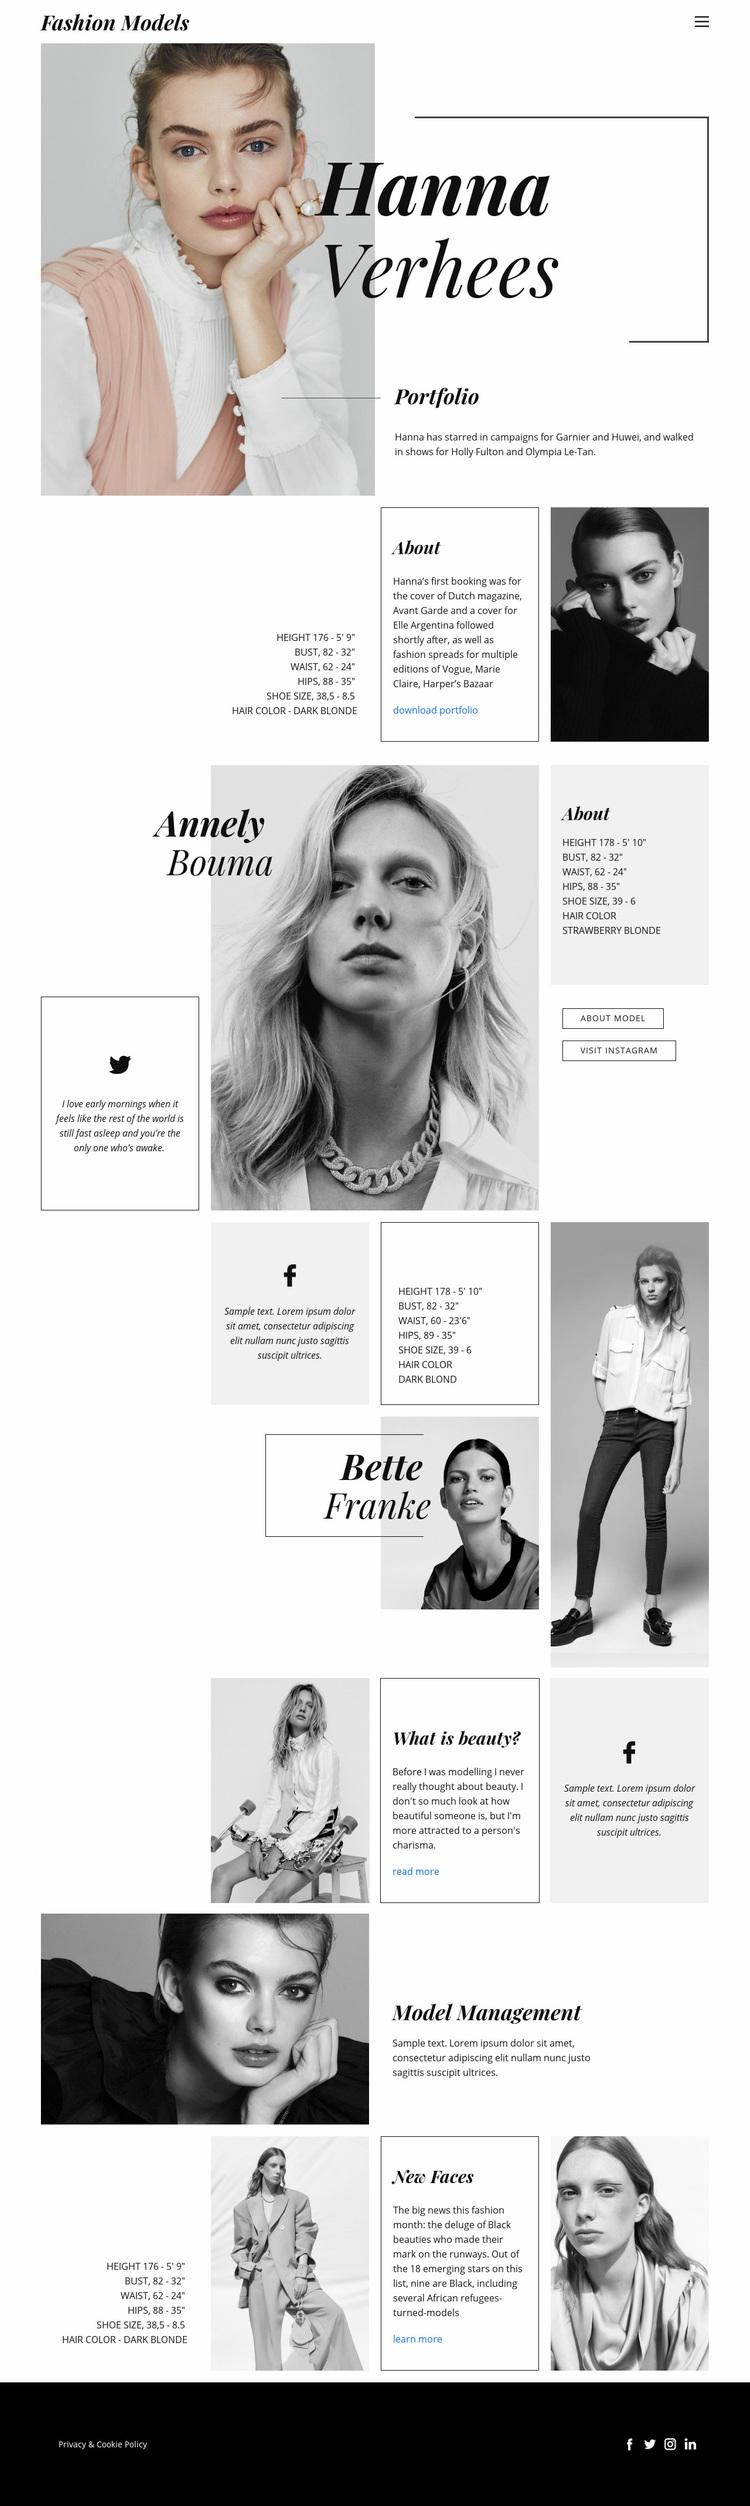 Hanna Verhees Blog Web Page Designer